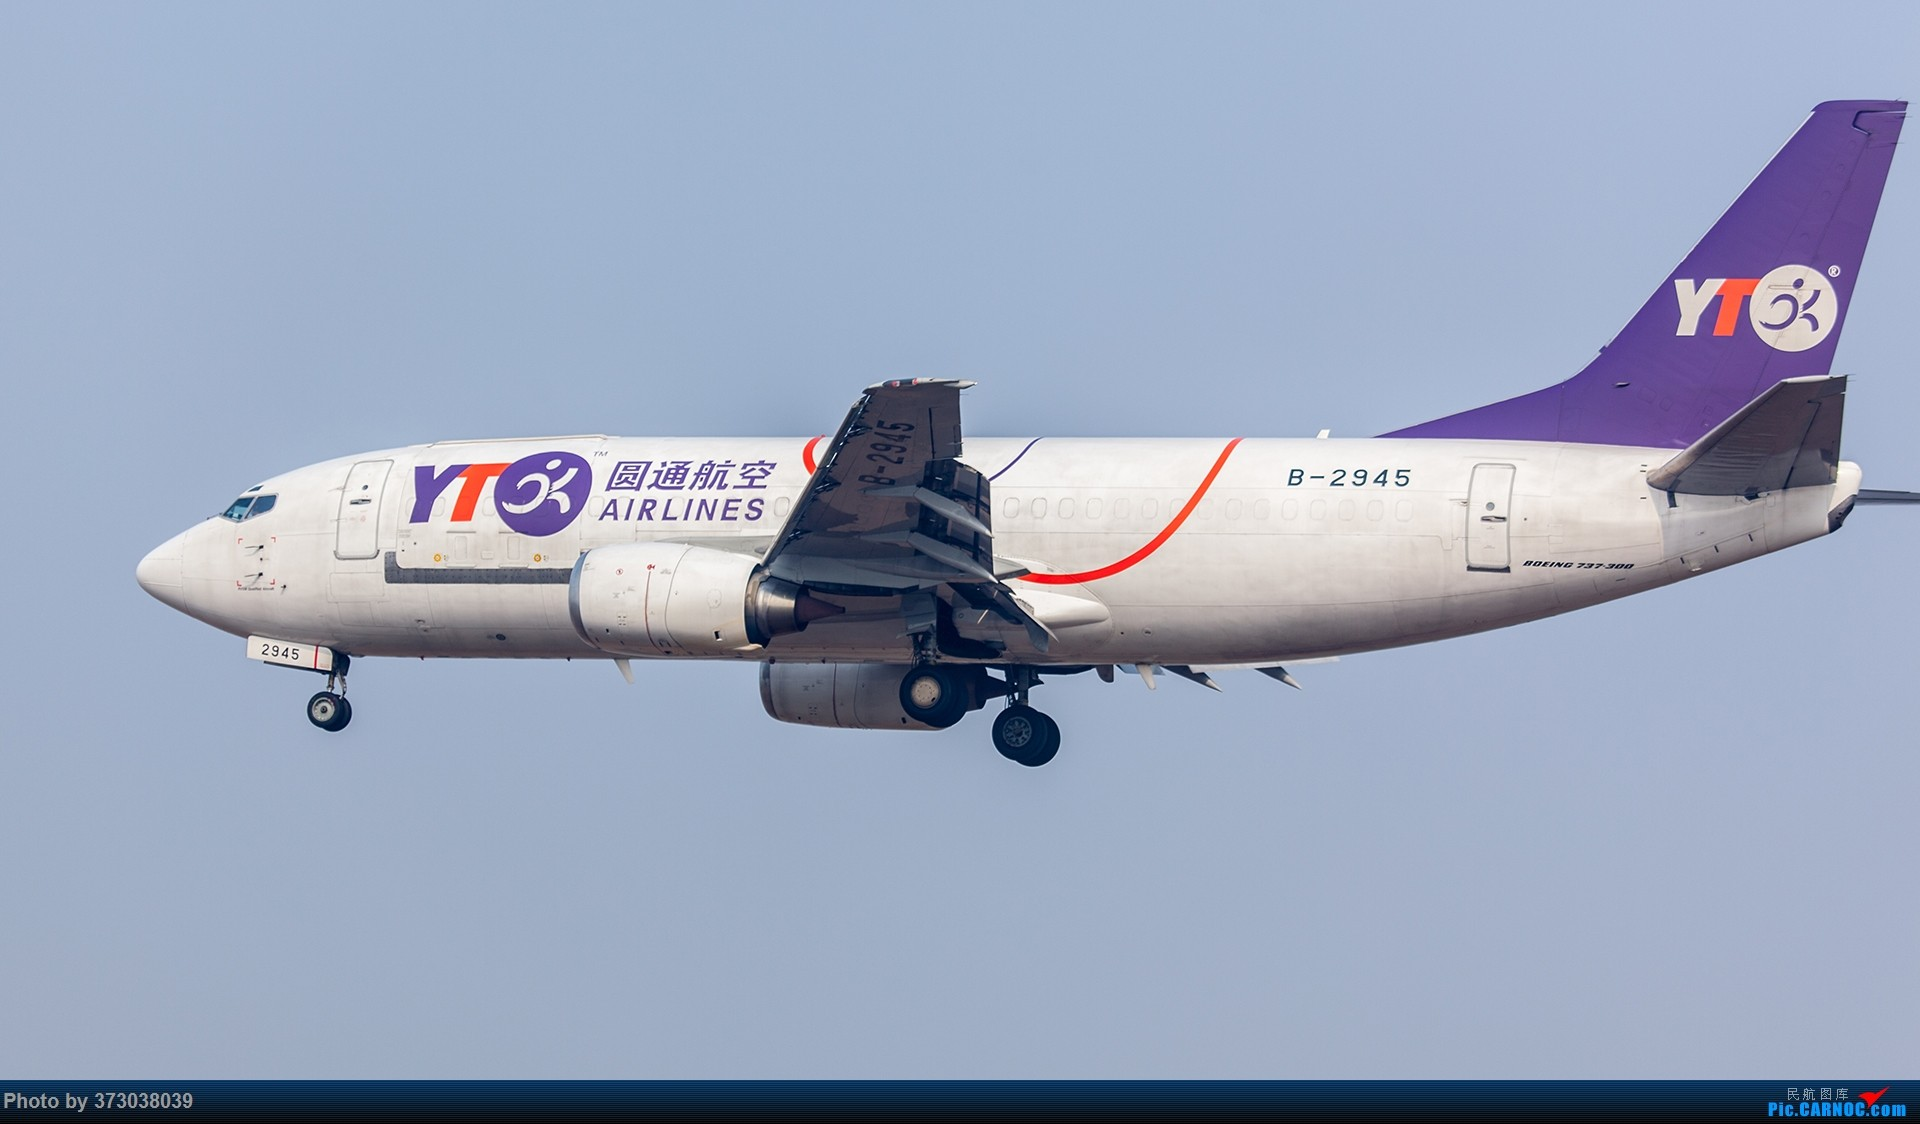 Re:[原创]【杭州飞友会 】50周年,烂大街的波音737 杭州飞友接力照 BOEING 737-300 B-2945 中国杭州萧山国际机场